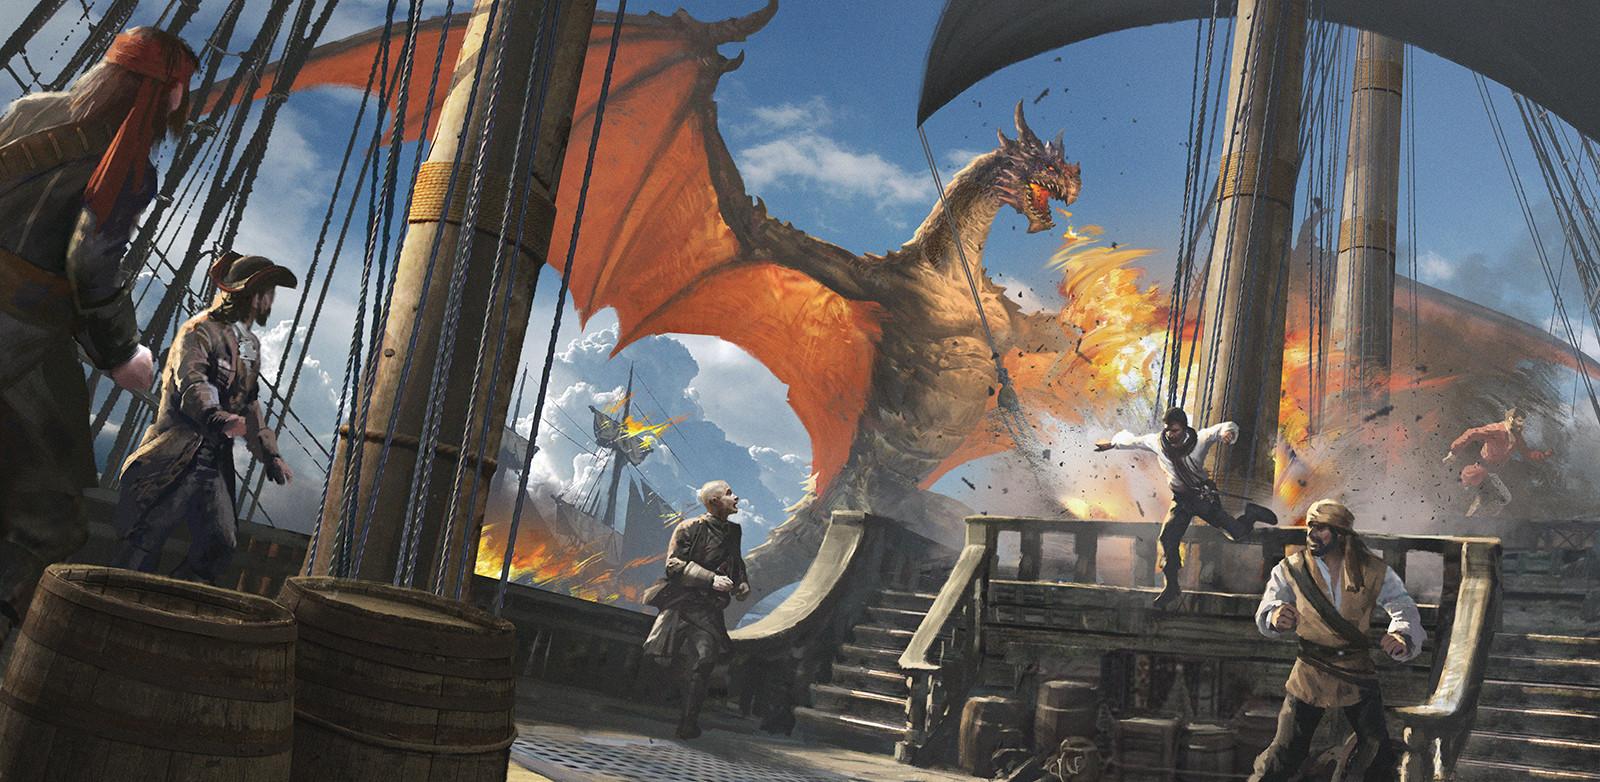 Vinh pham 1607 attack of dragon